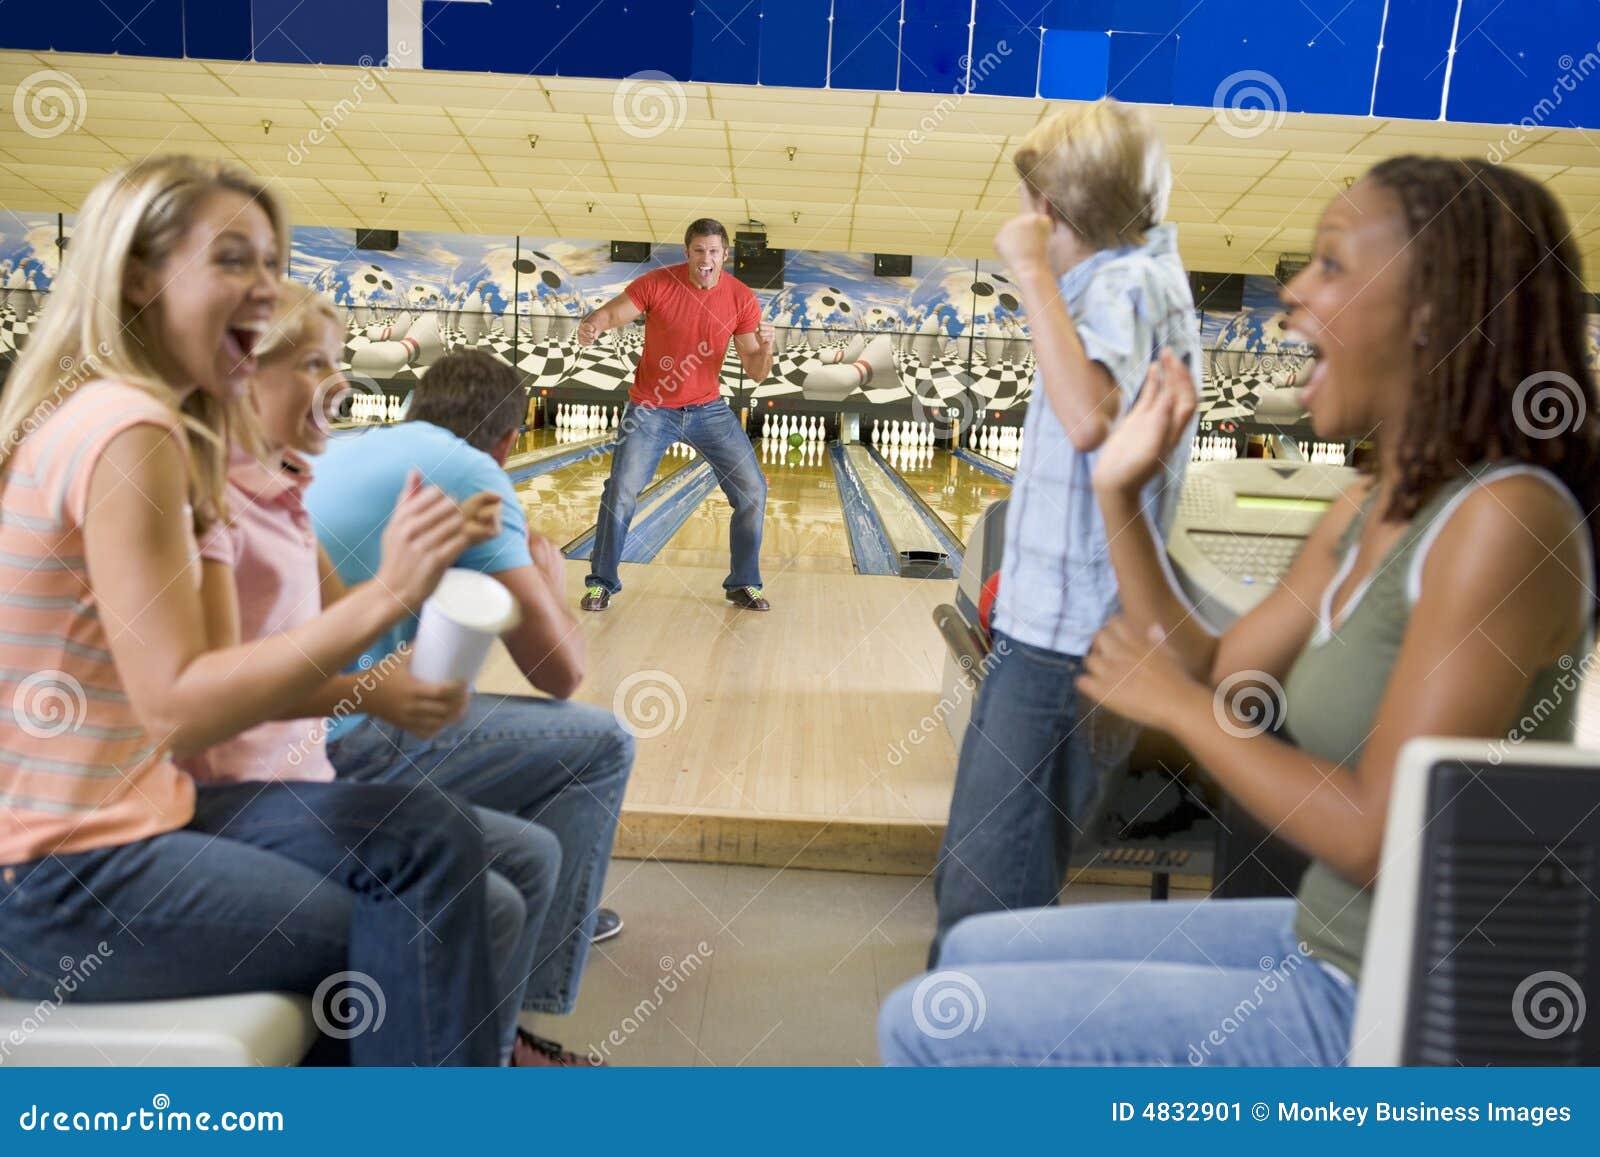 Familien auf Reise zur Bowlingbahn